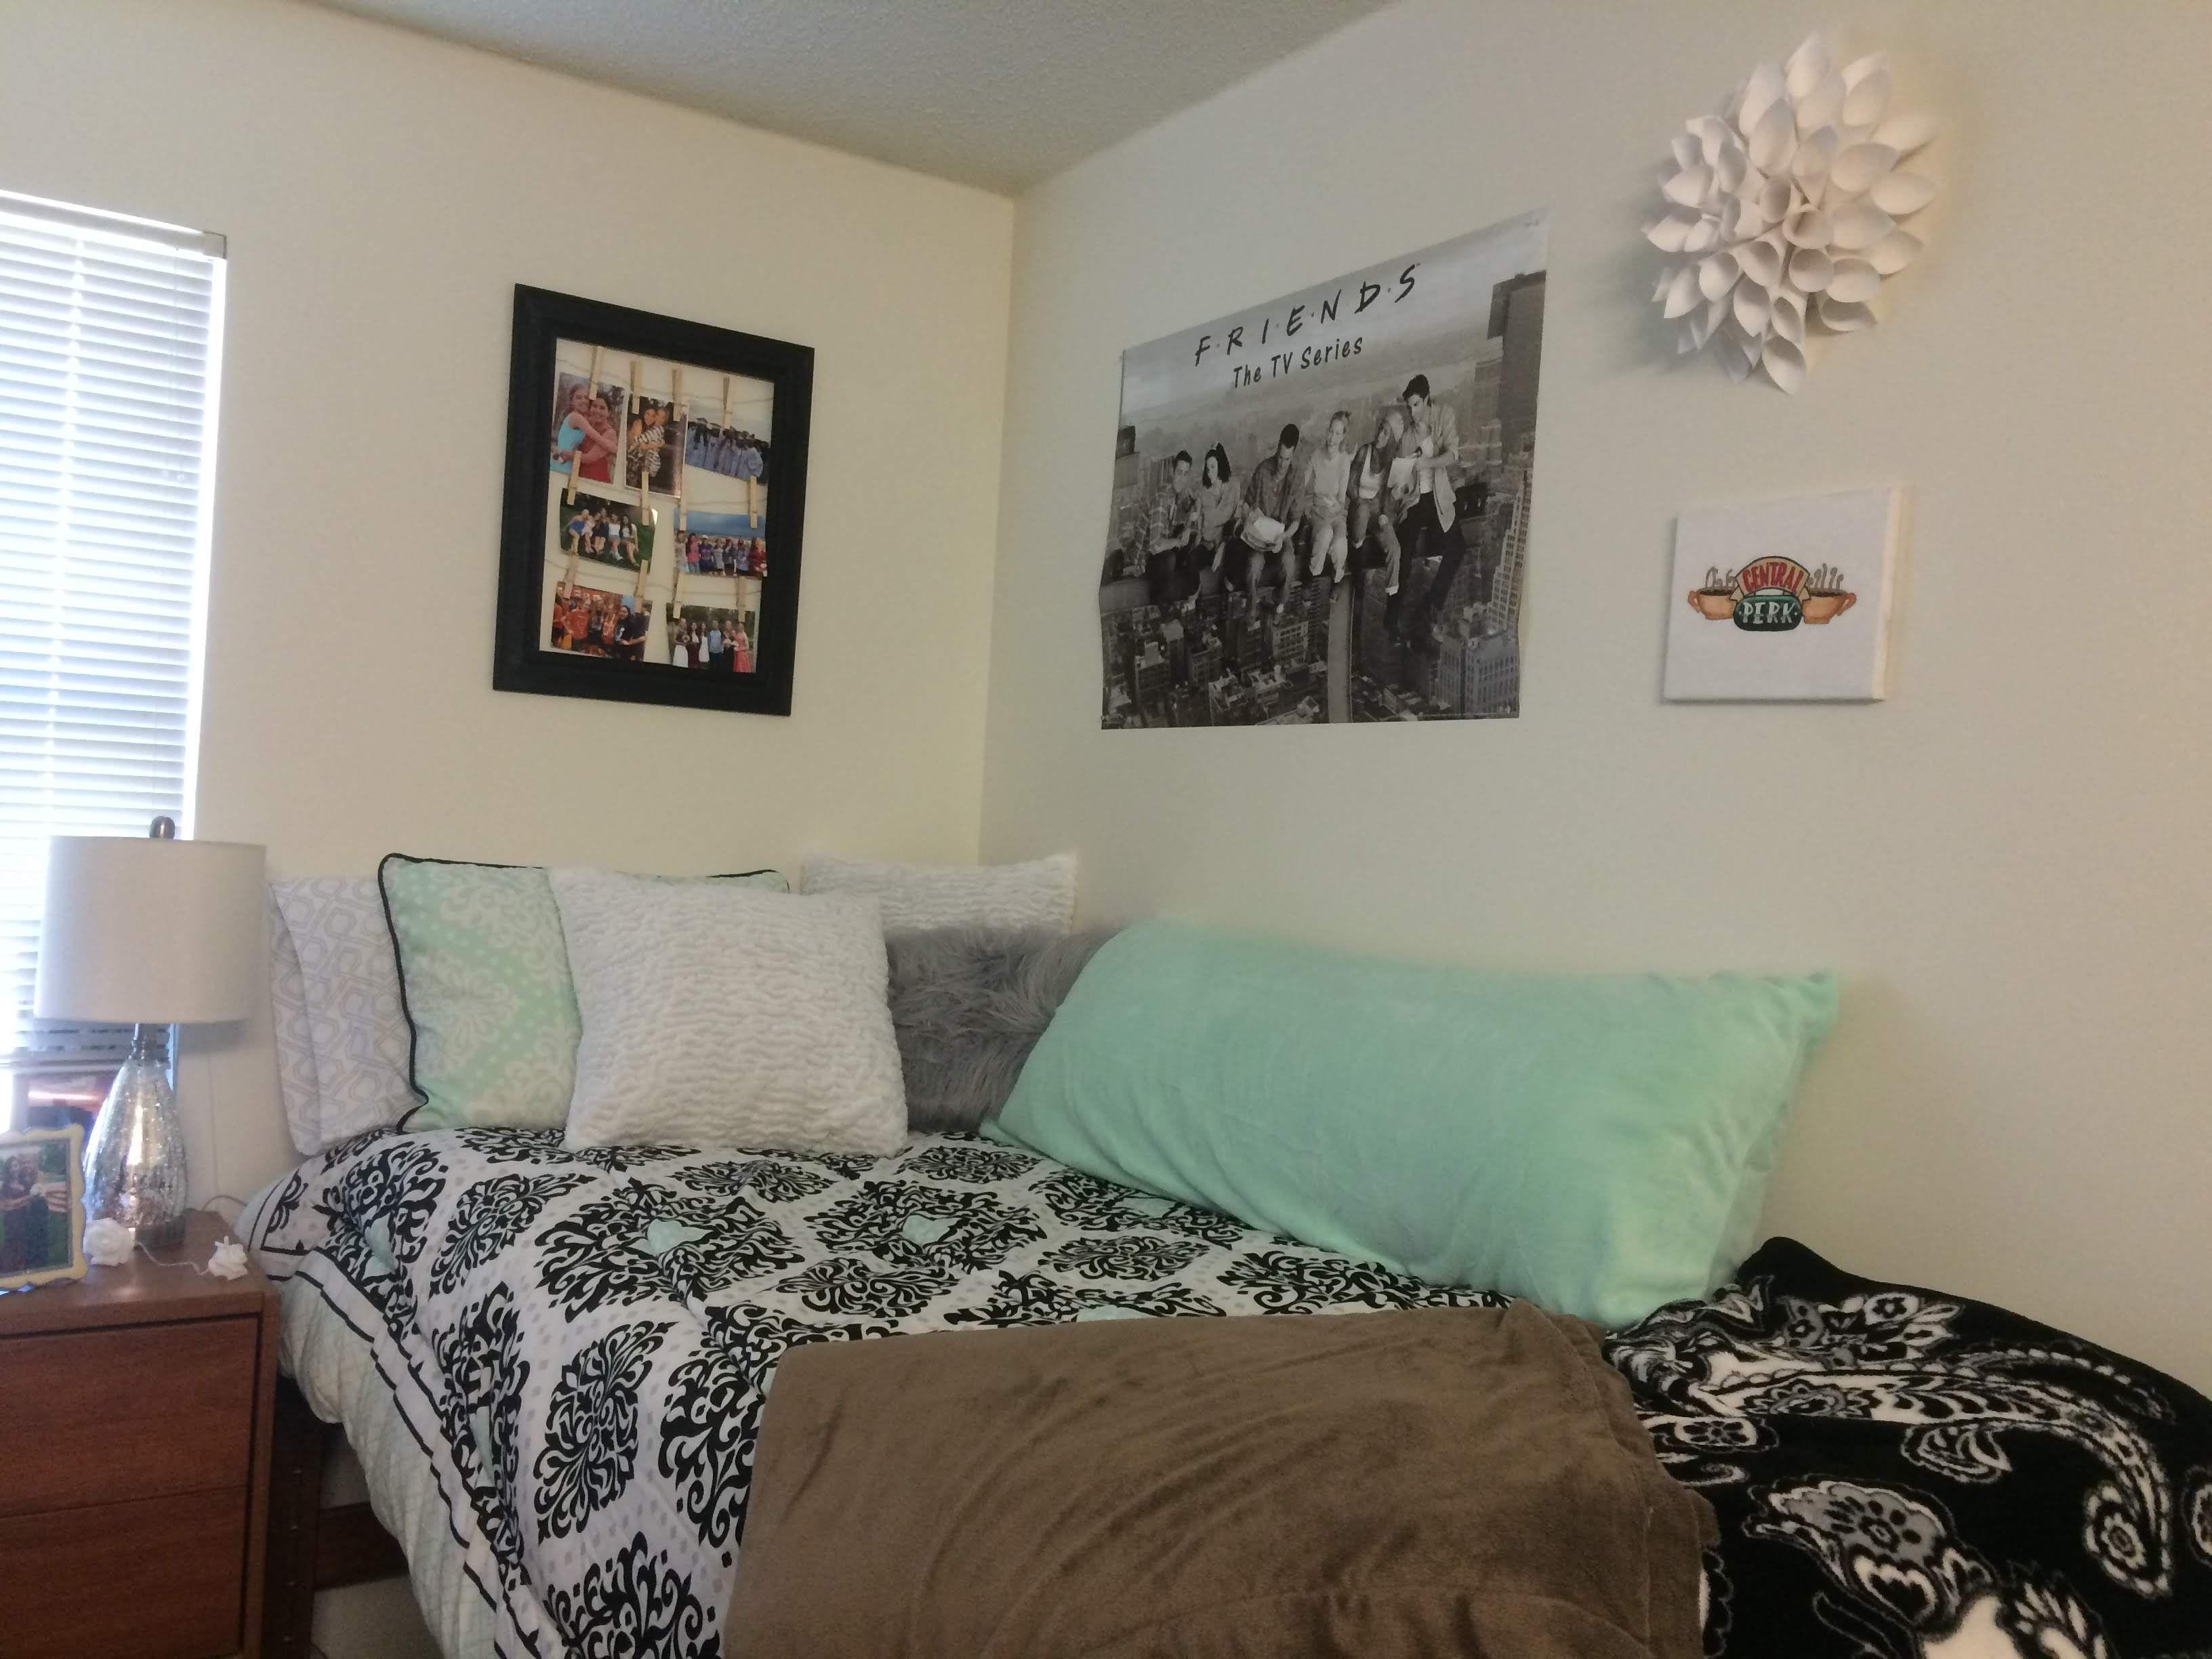 Brandywine Hall 1x1 Room Decor Bed Bath And Beyond Student House